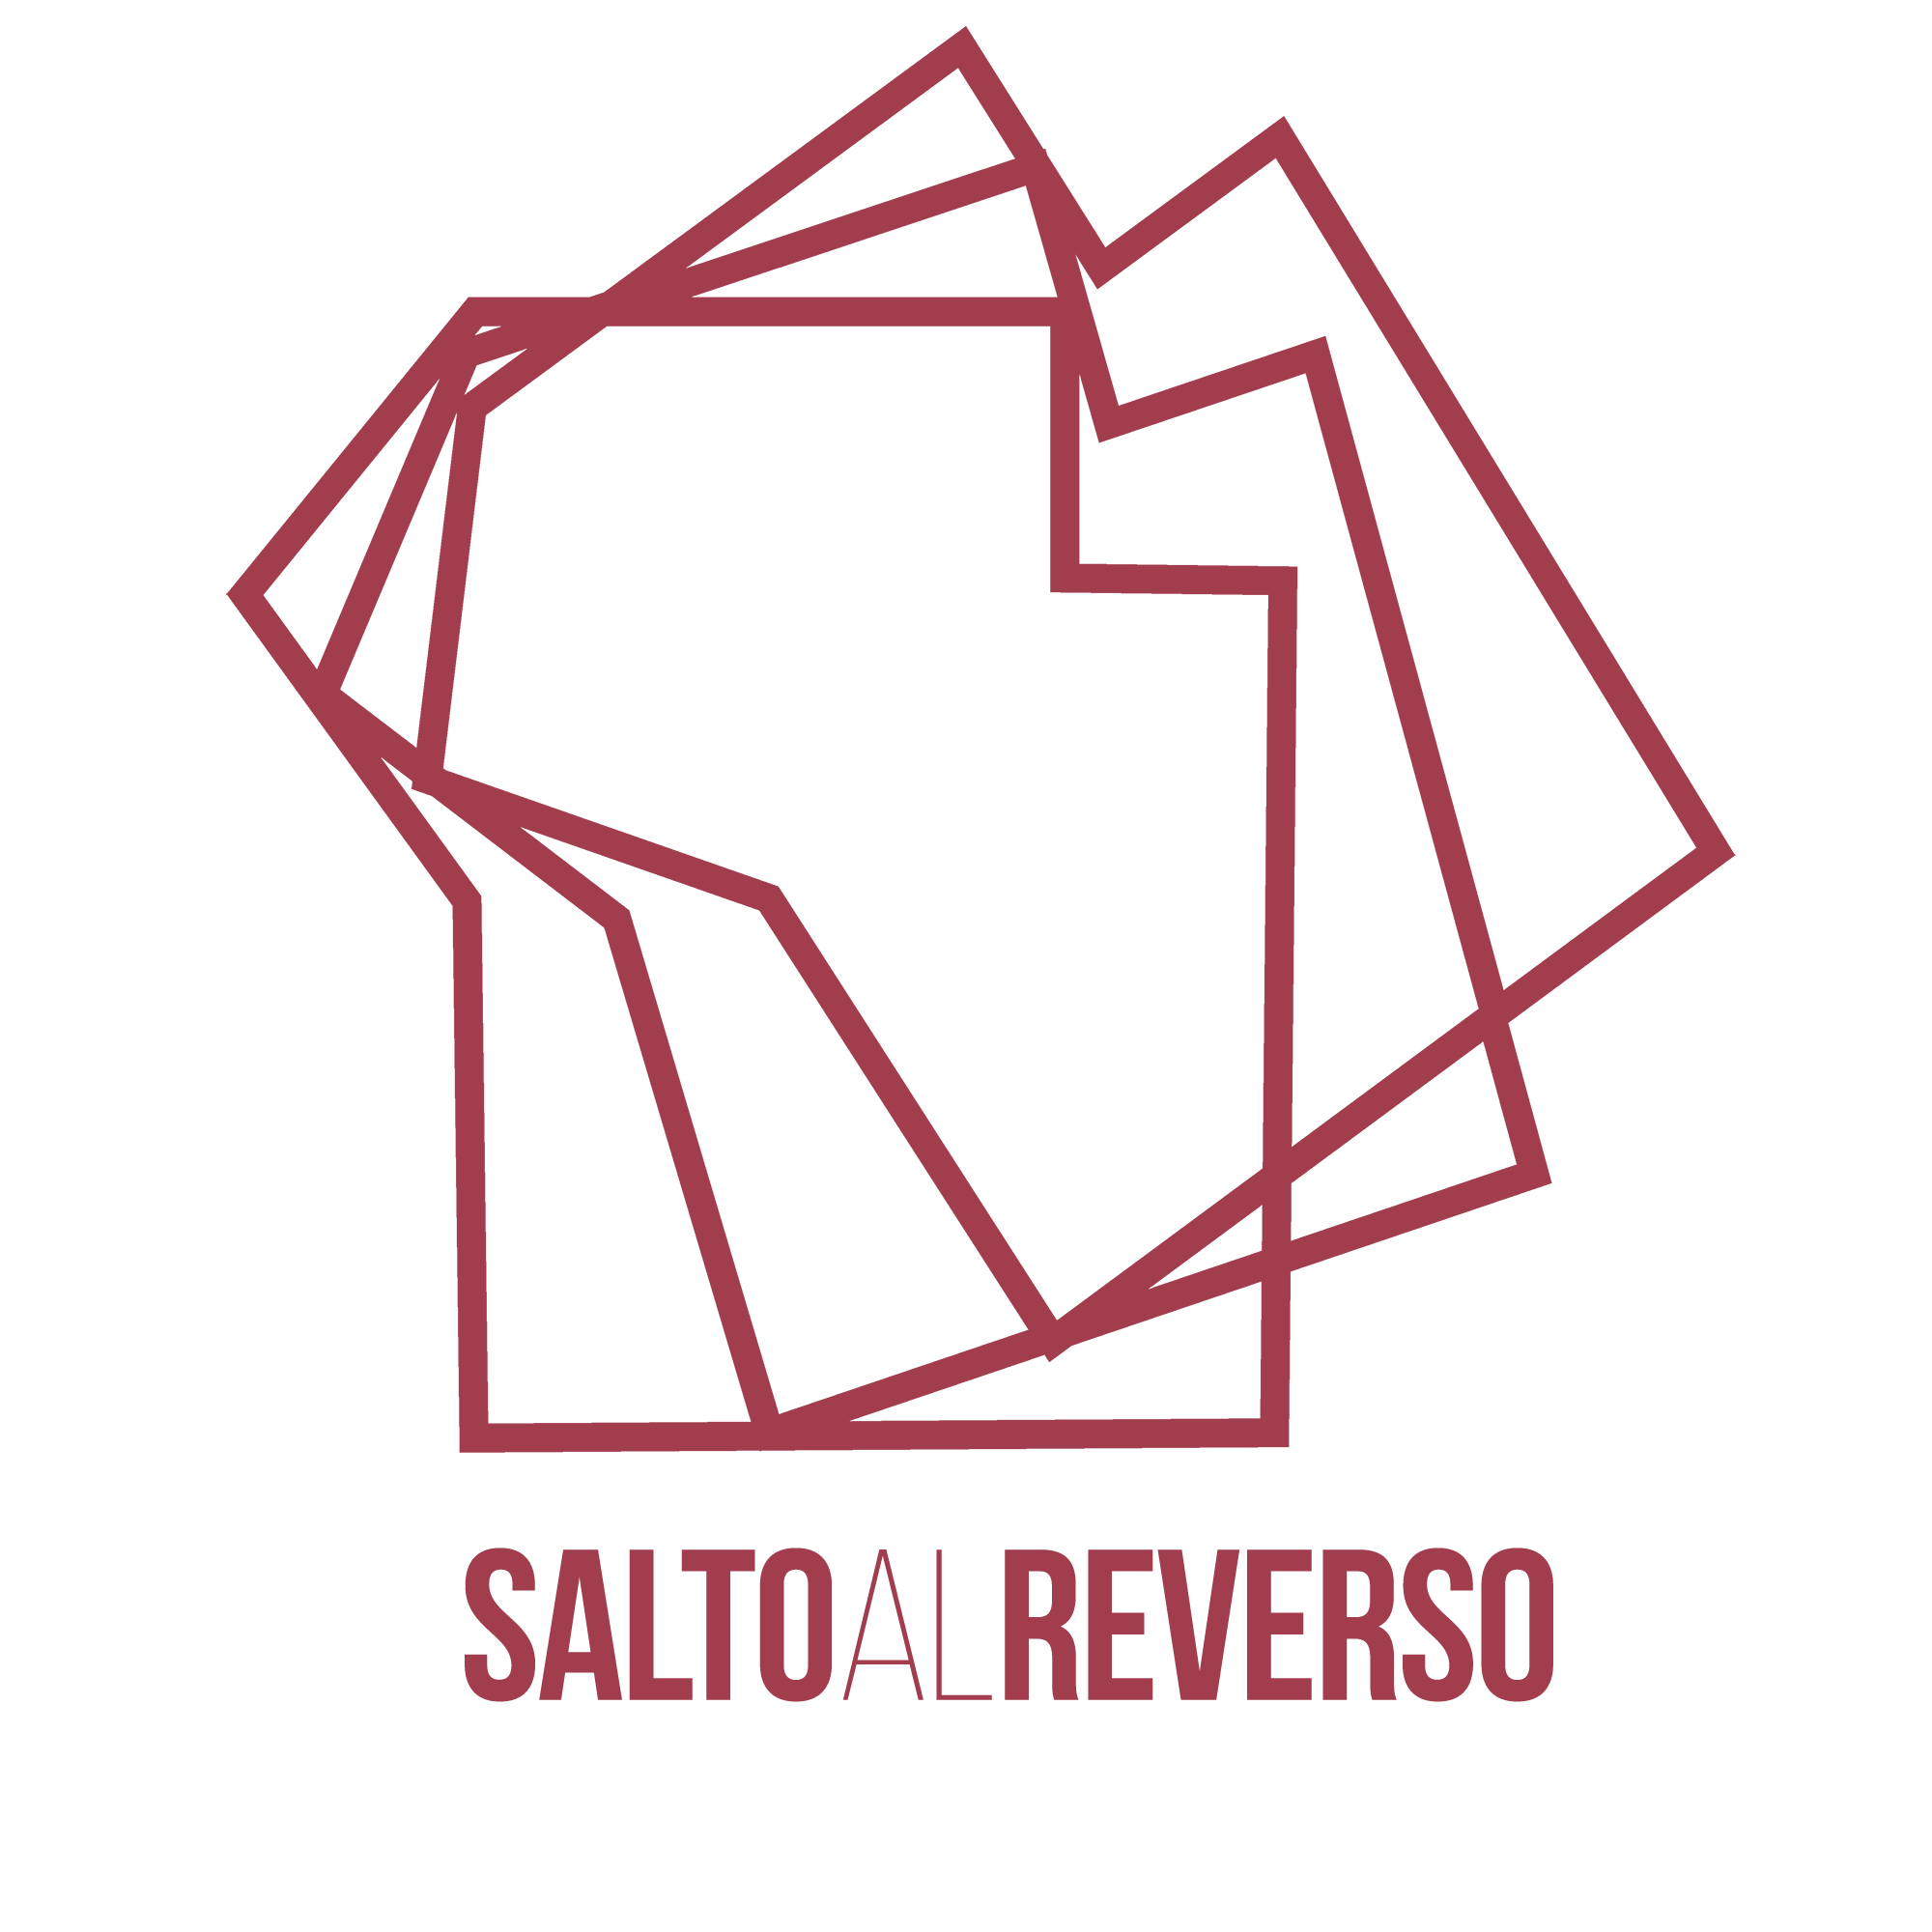 Editorial SALTO AL REVERSO